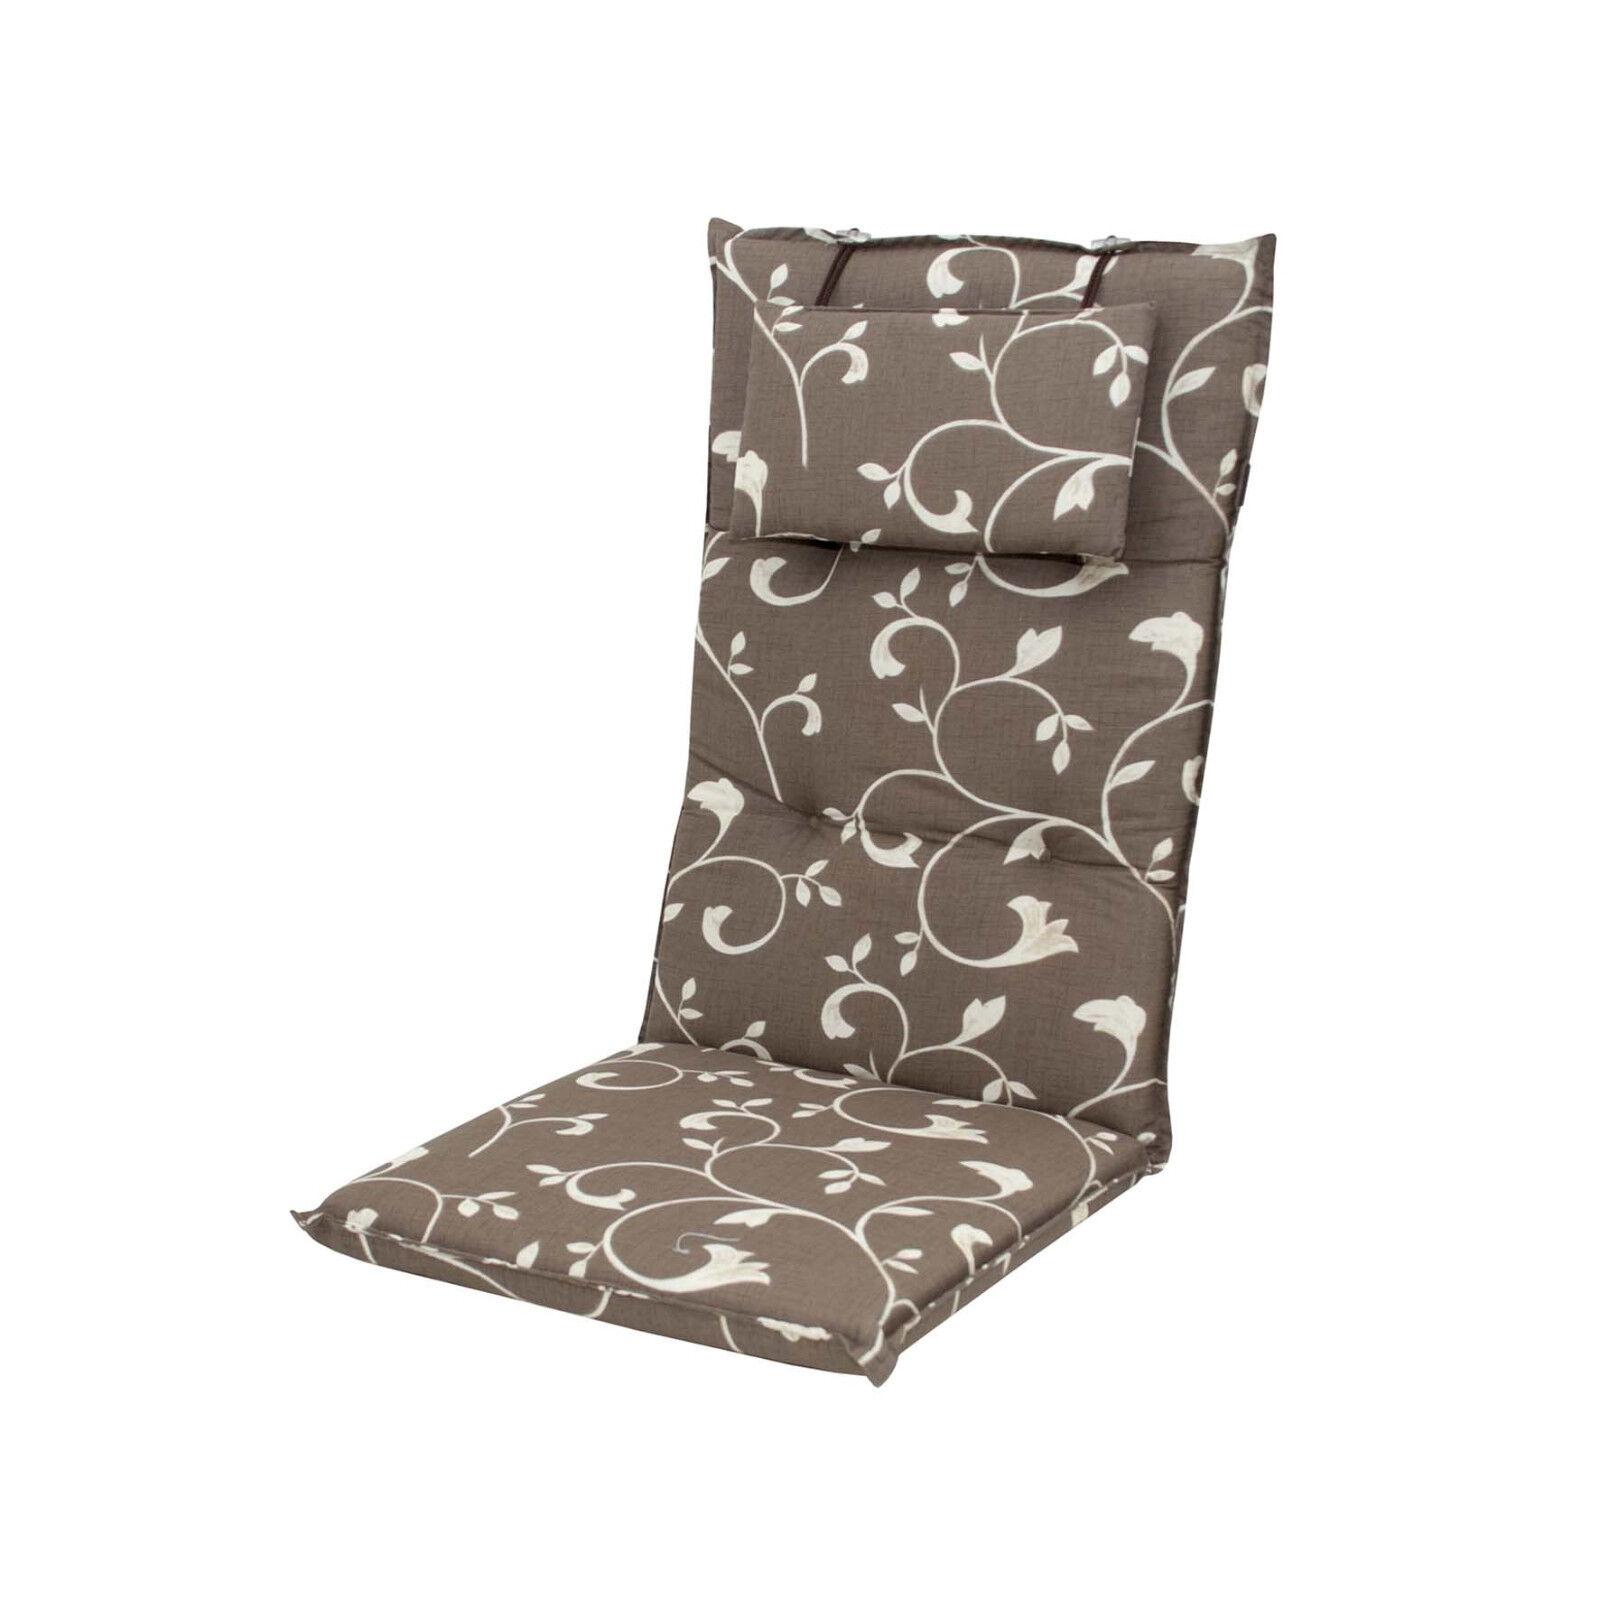 gartenm bel auflagen f r hochlehner sessel polster kissen gartenstuhl einleger ebay. Black Bedroom Furniture Sets. Home Design Ideas